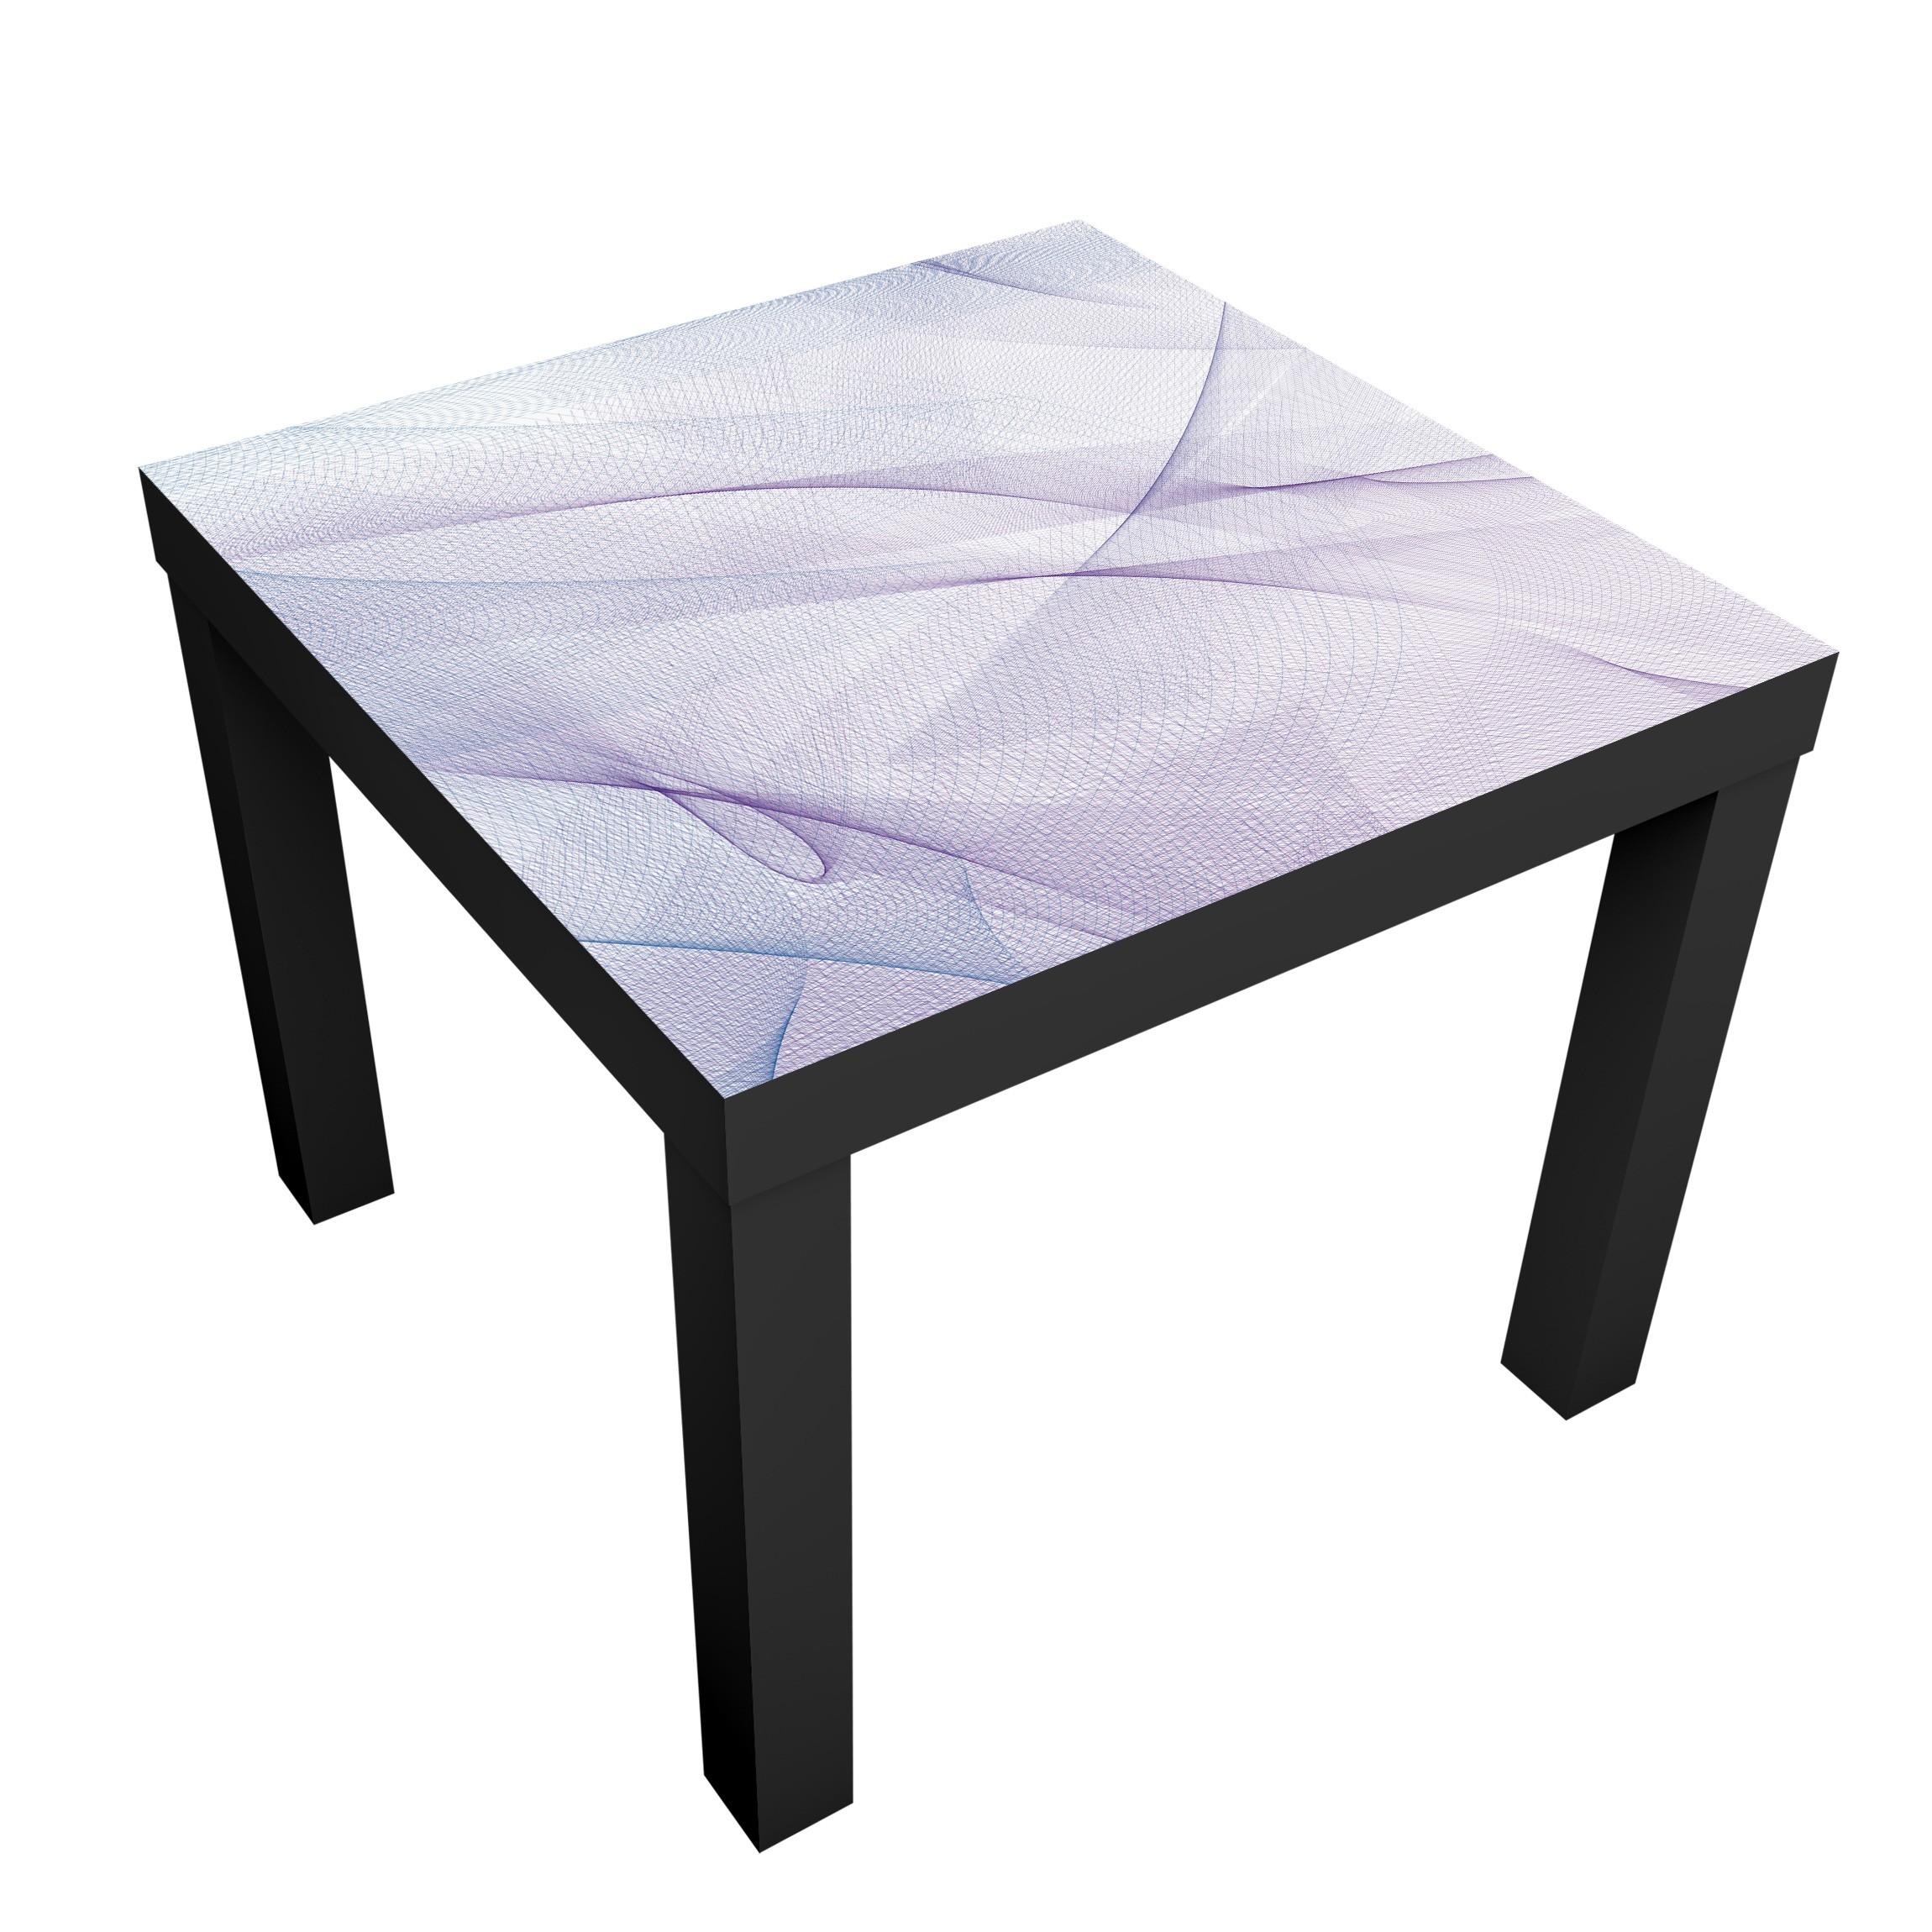 Carta adesiva per mobili ikea lack tavolino no ry9 taubenflug - Ikea lack tavolino ...